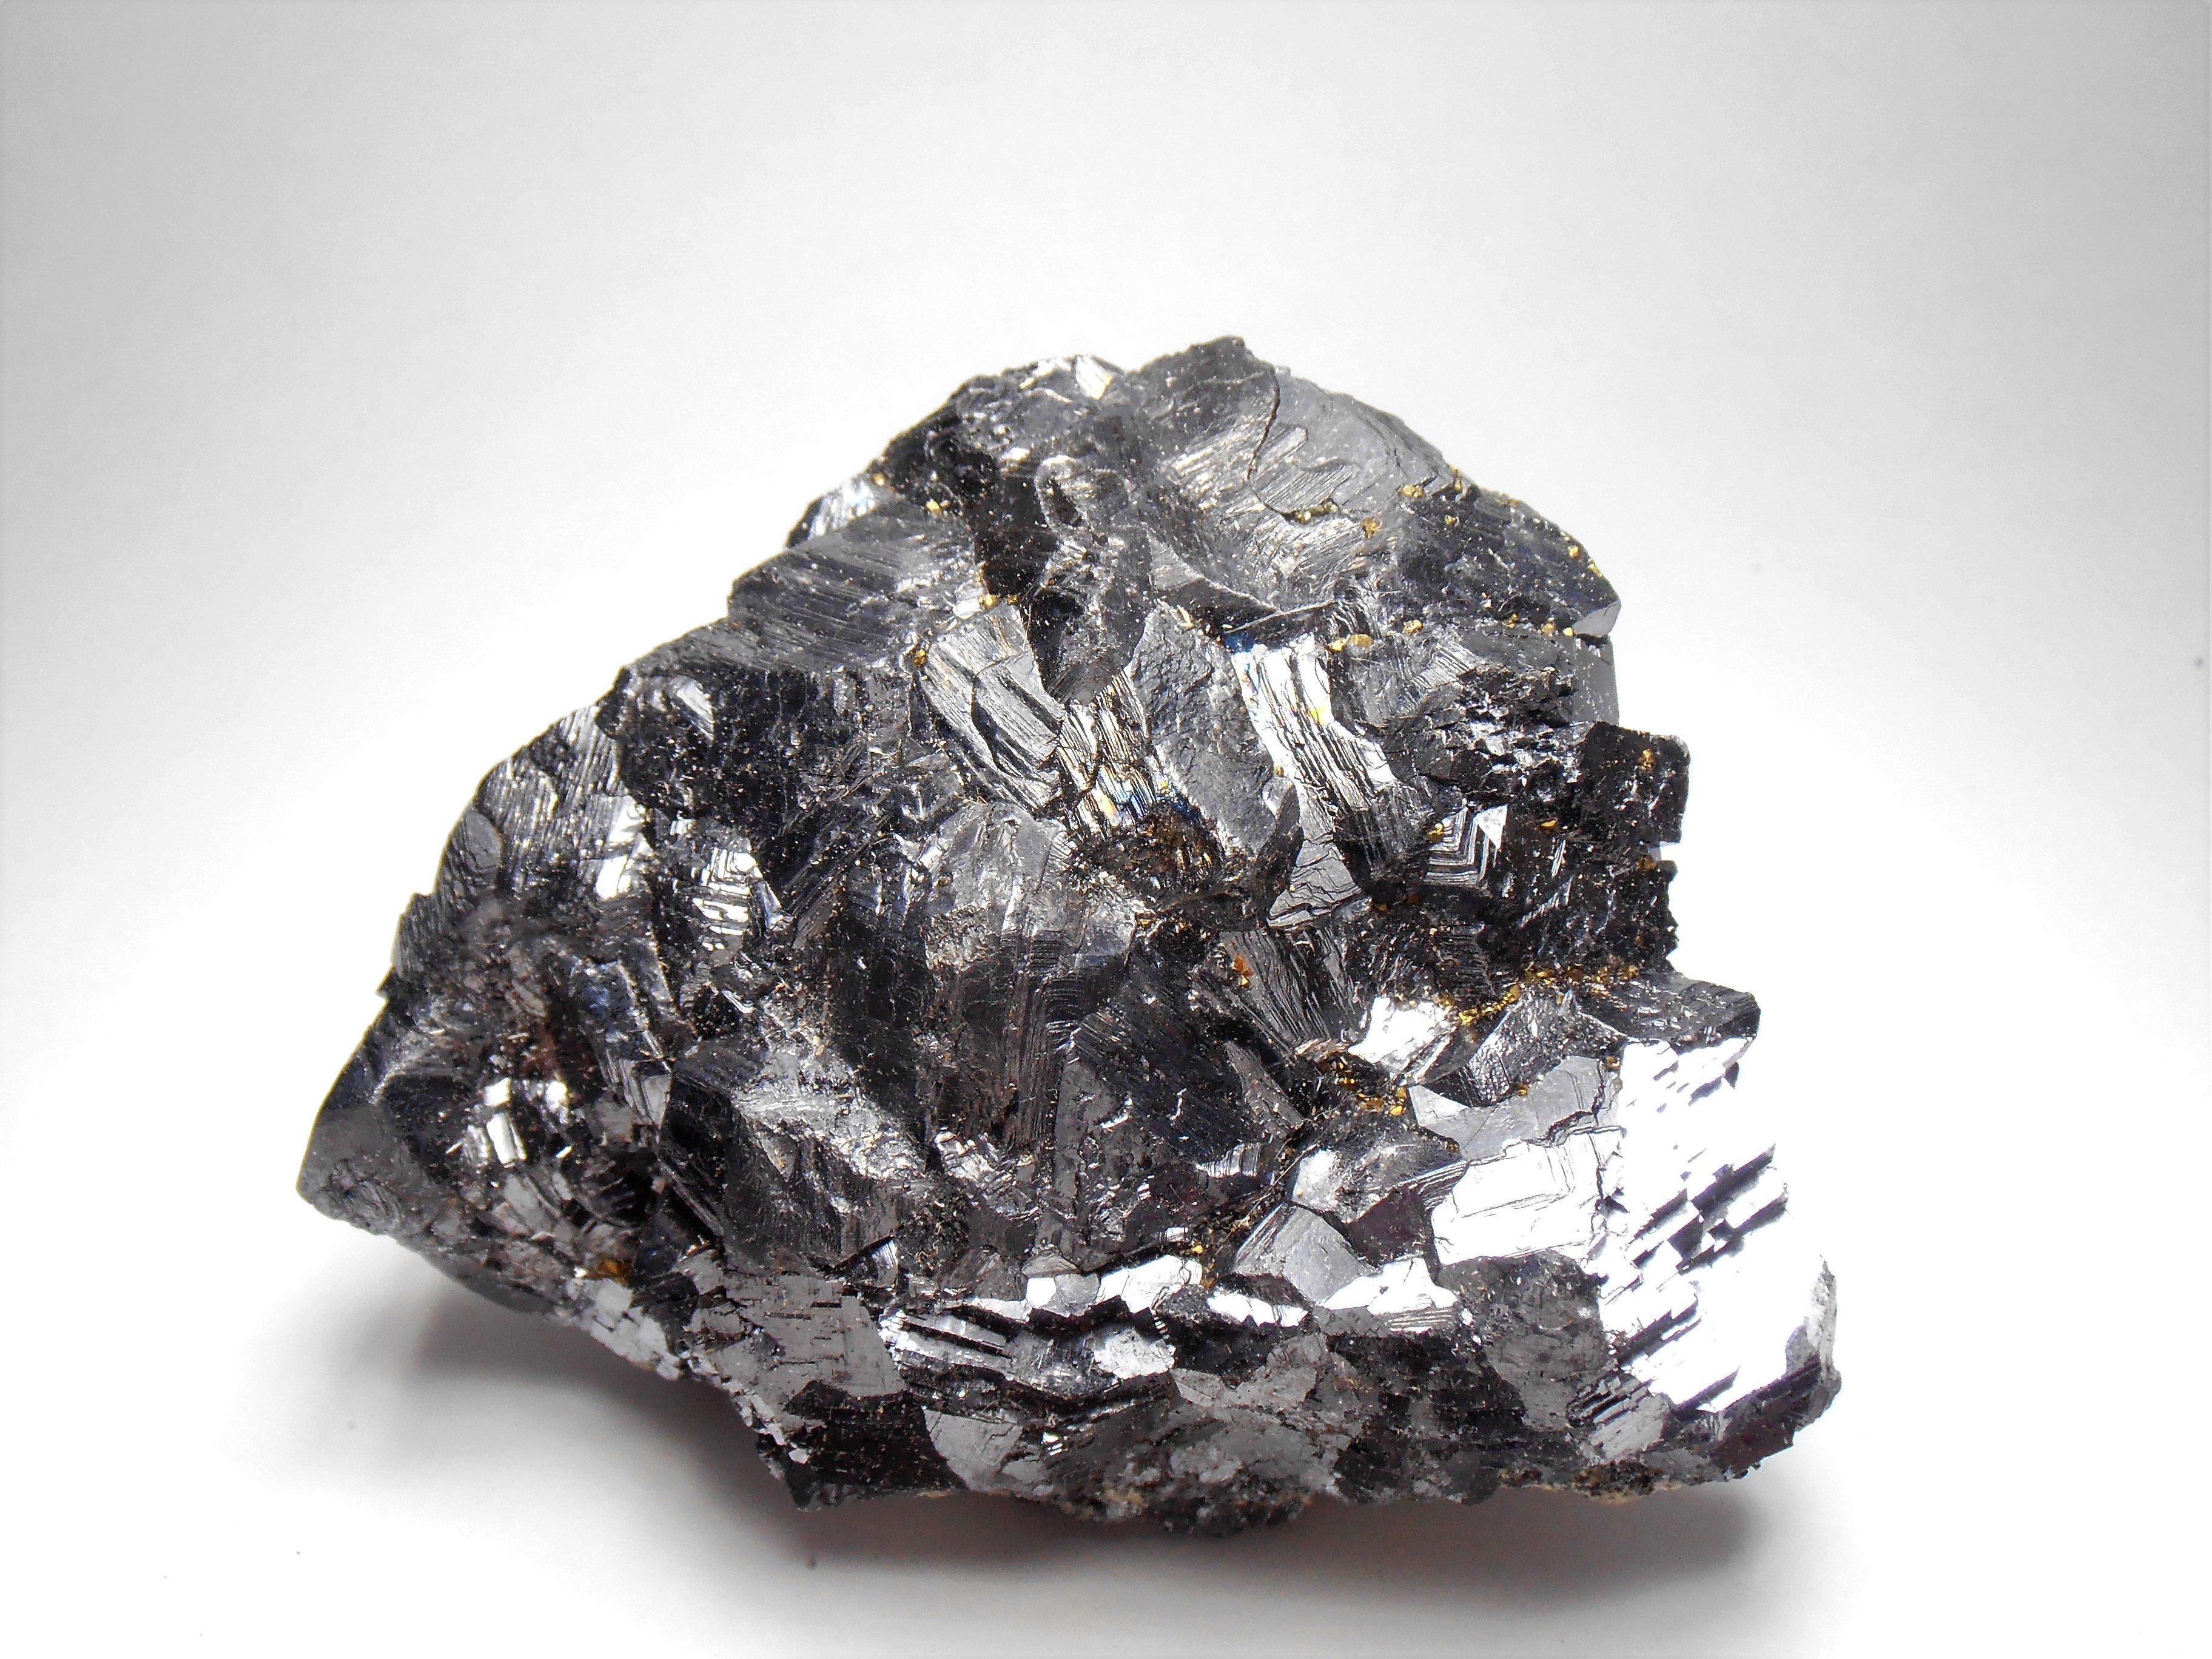 Galena - Complex Crystal Plate from the Naica Mine, Mun. de Saucillo